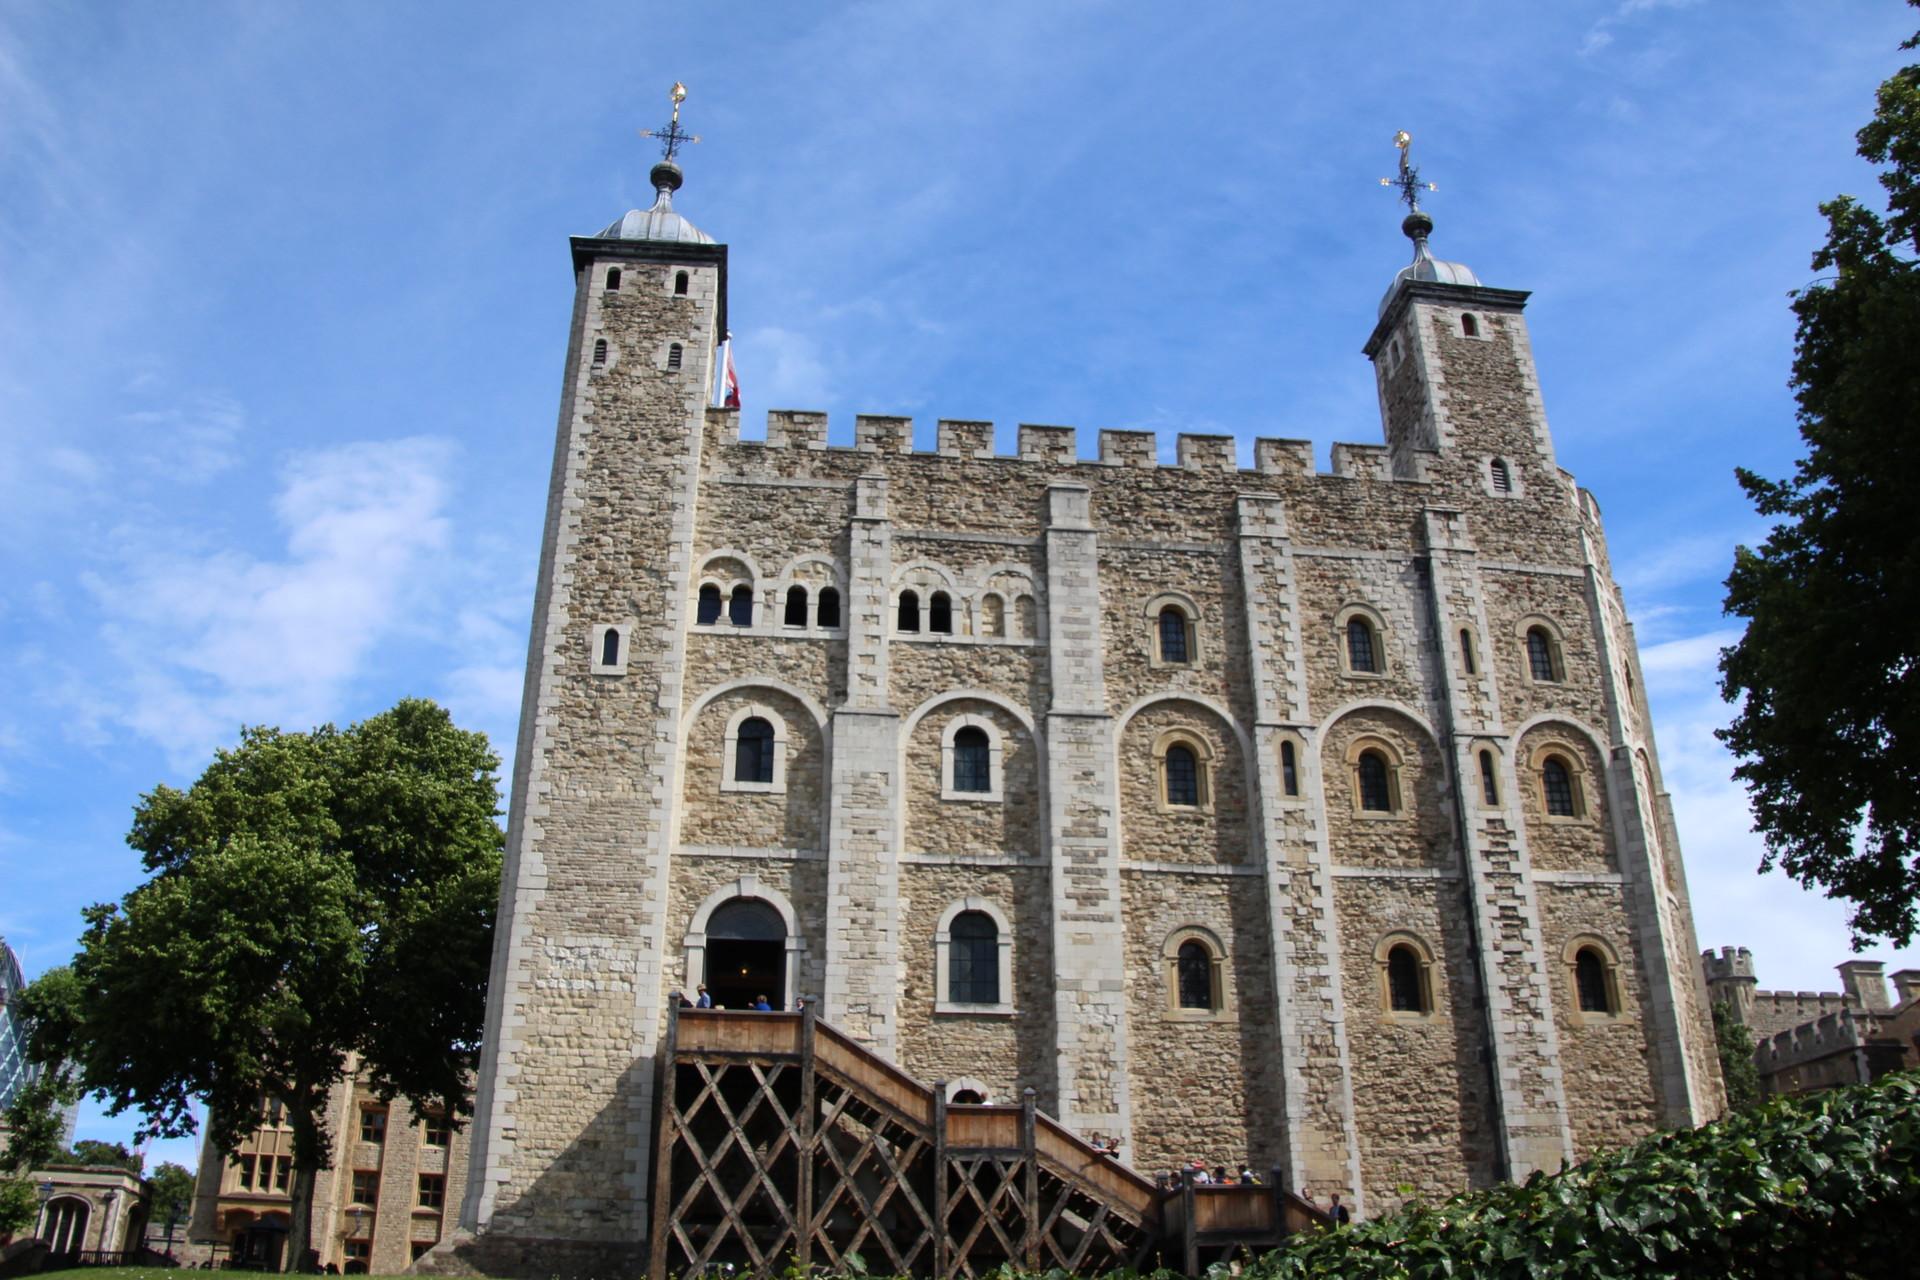 tower-of-london-la-torre-londres-90d5db2